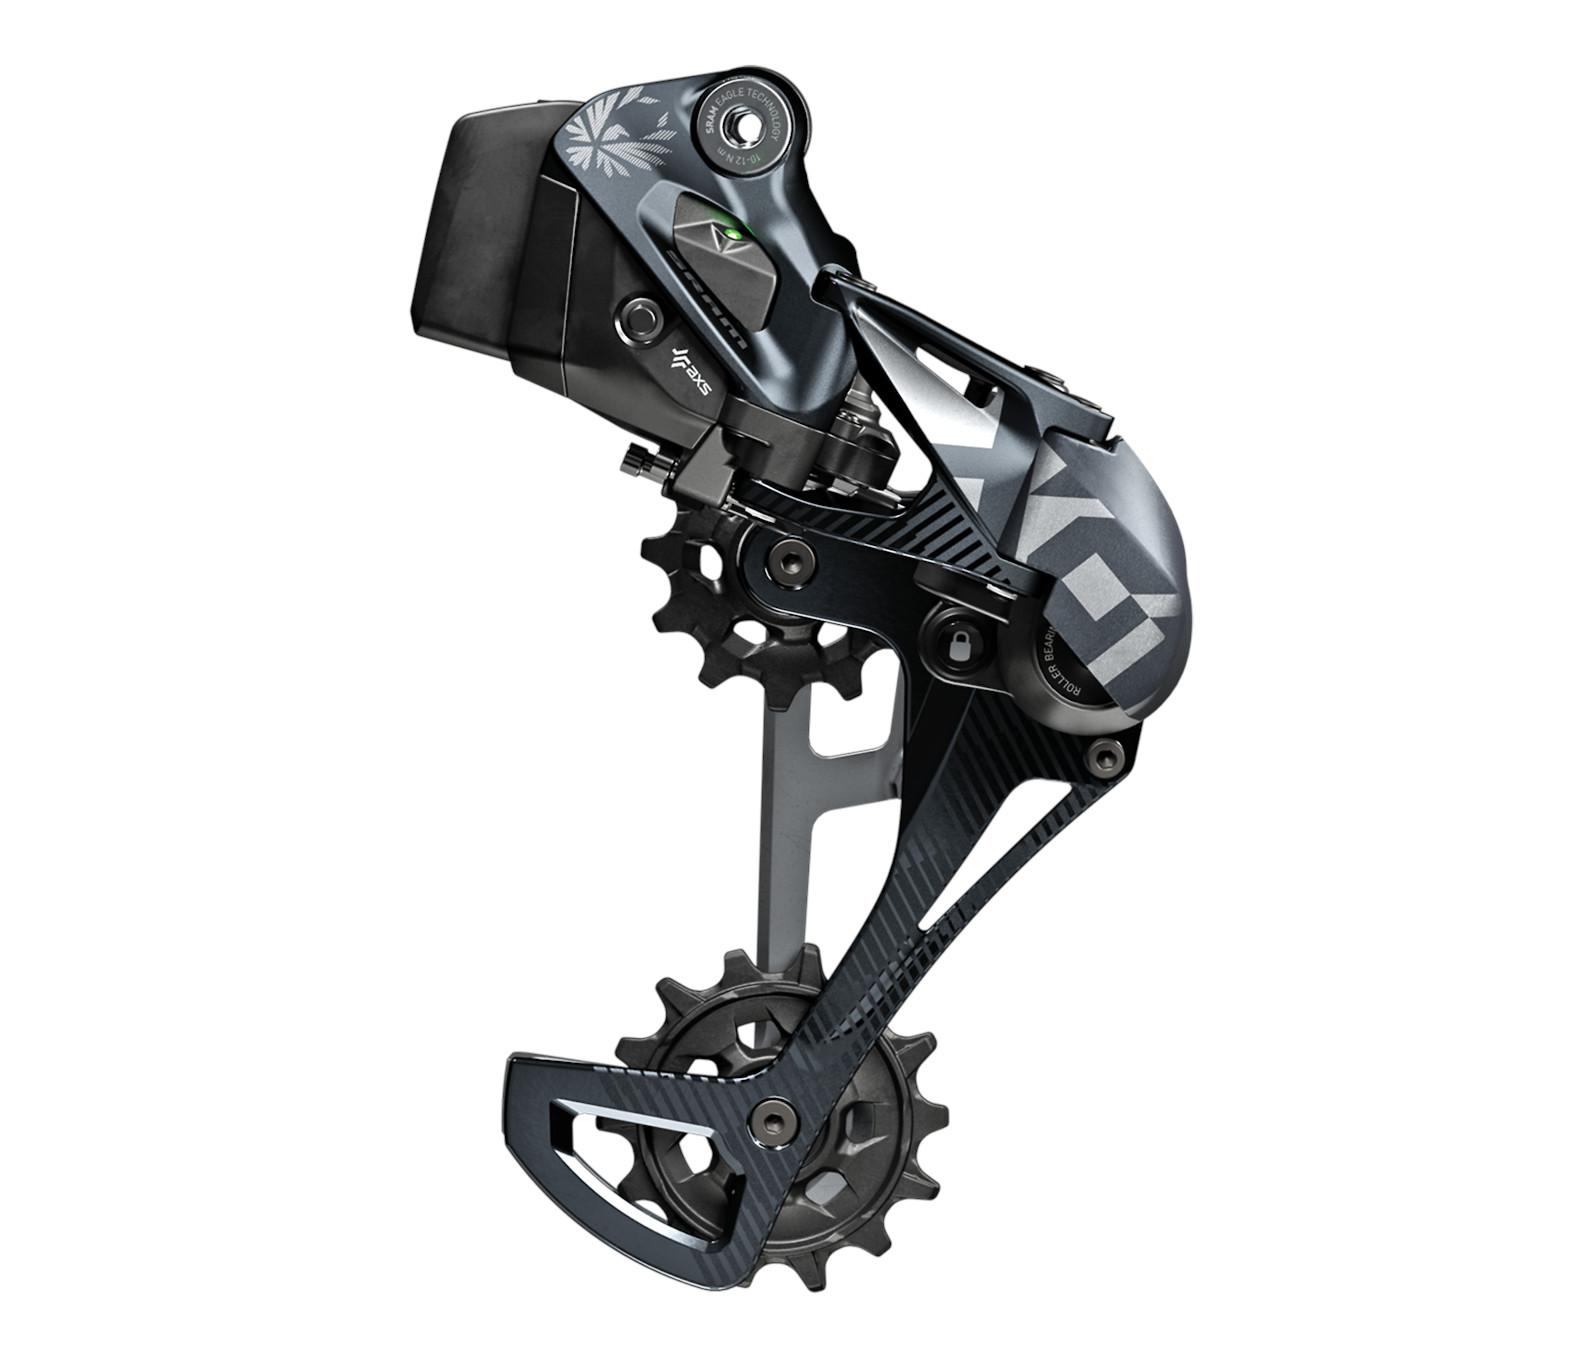 SRAM X01 Eagle AXS Rear Derailleur